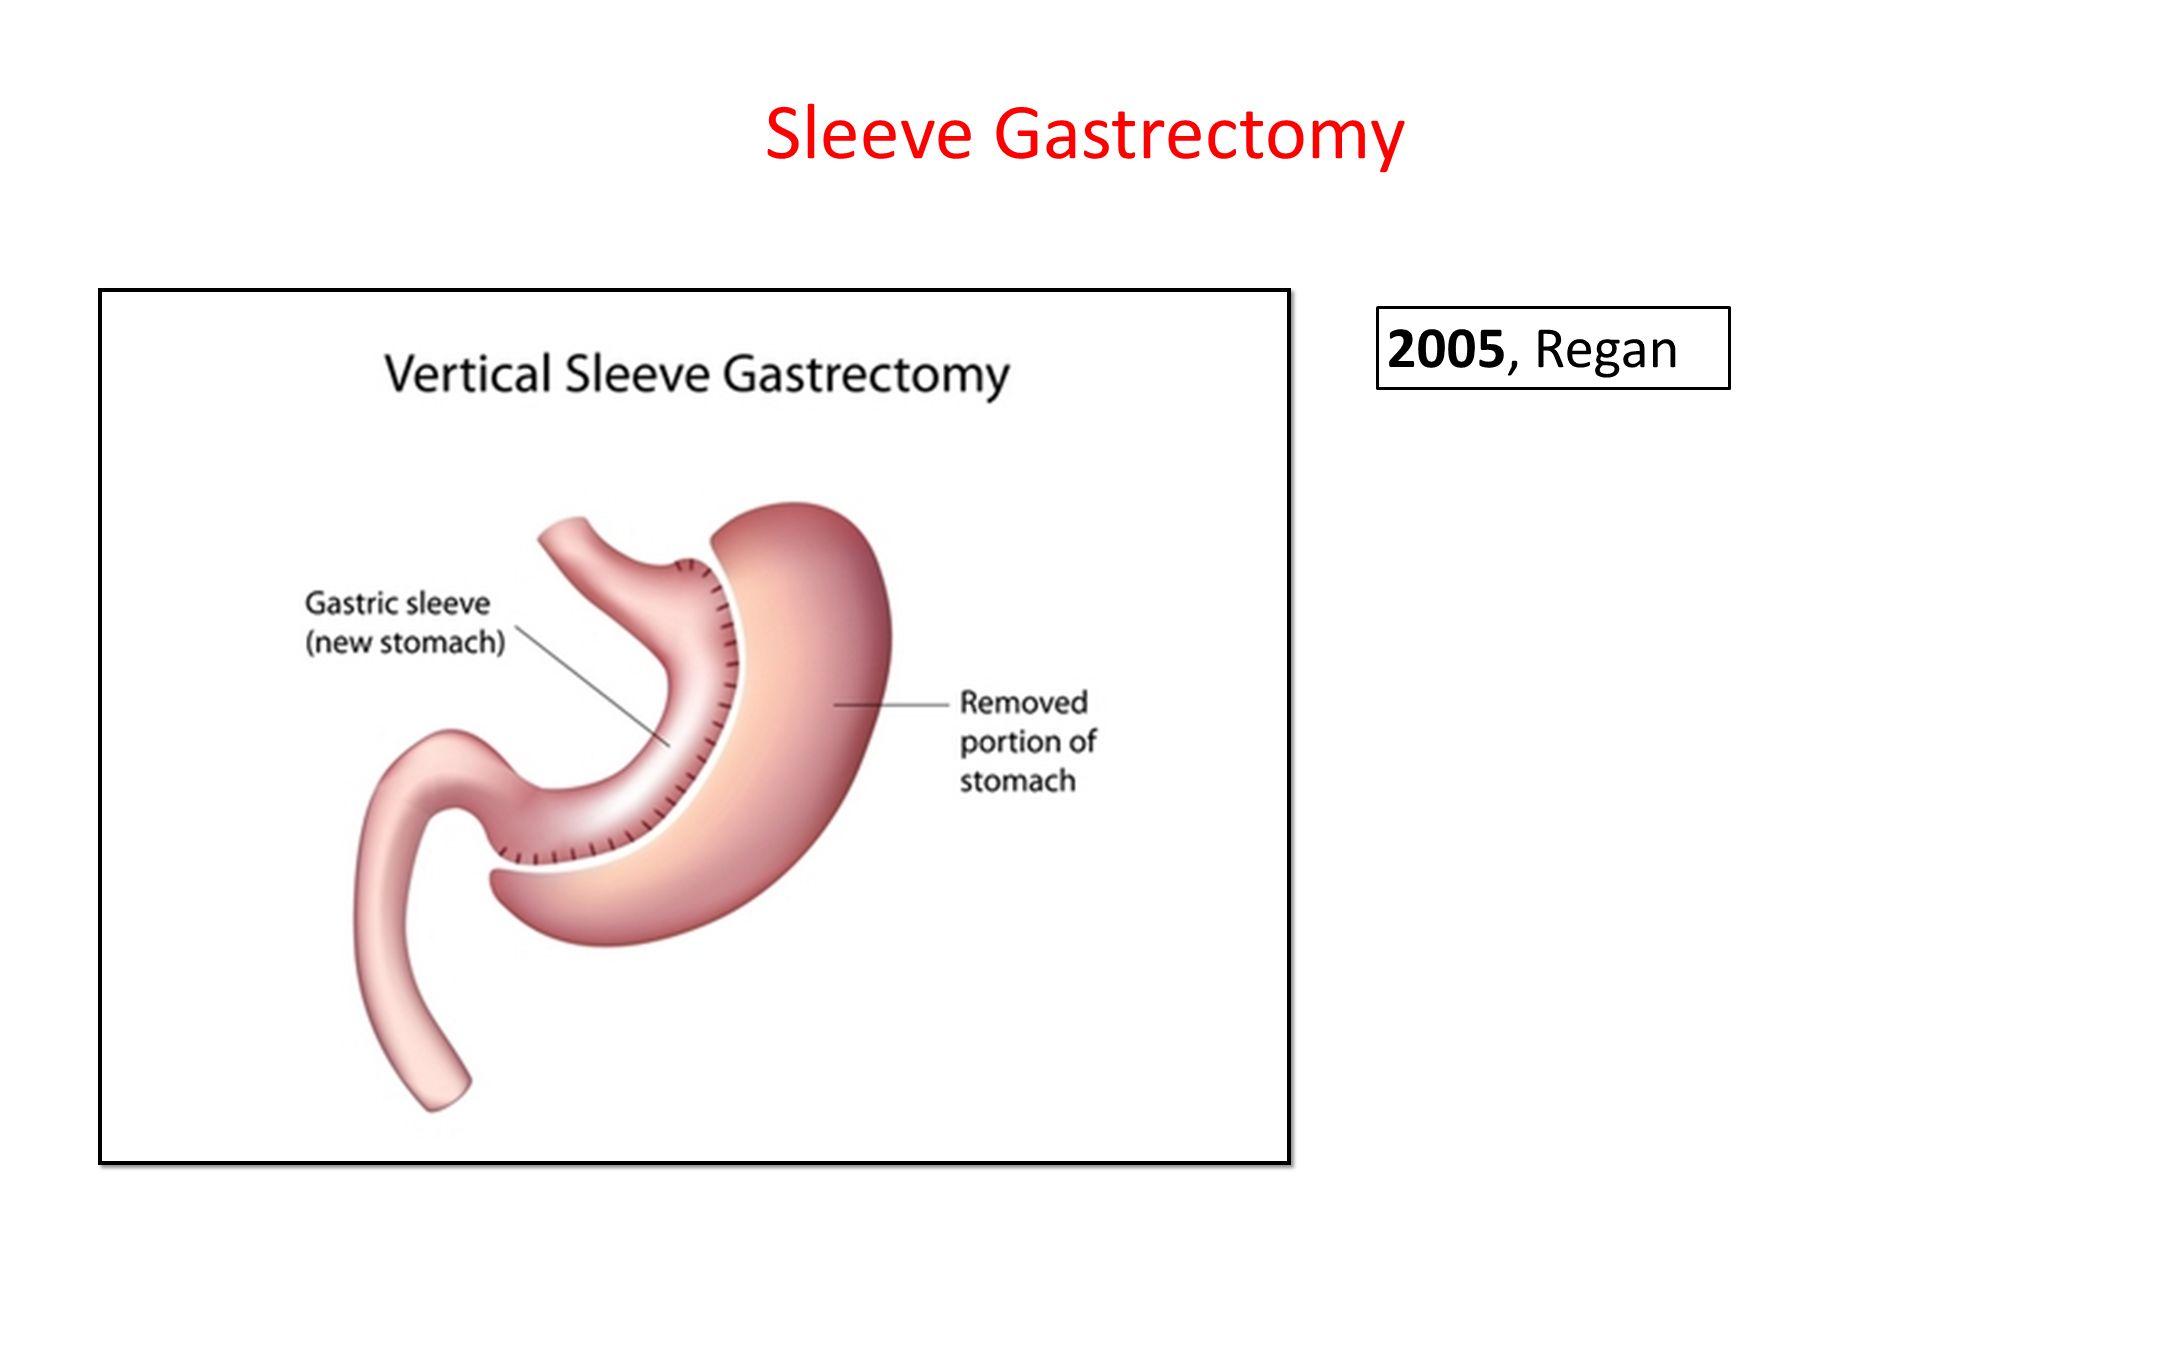 Sleeve Gastrectomy 2005, Regan